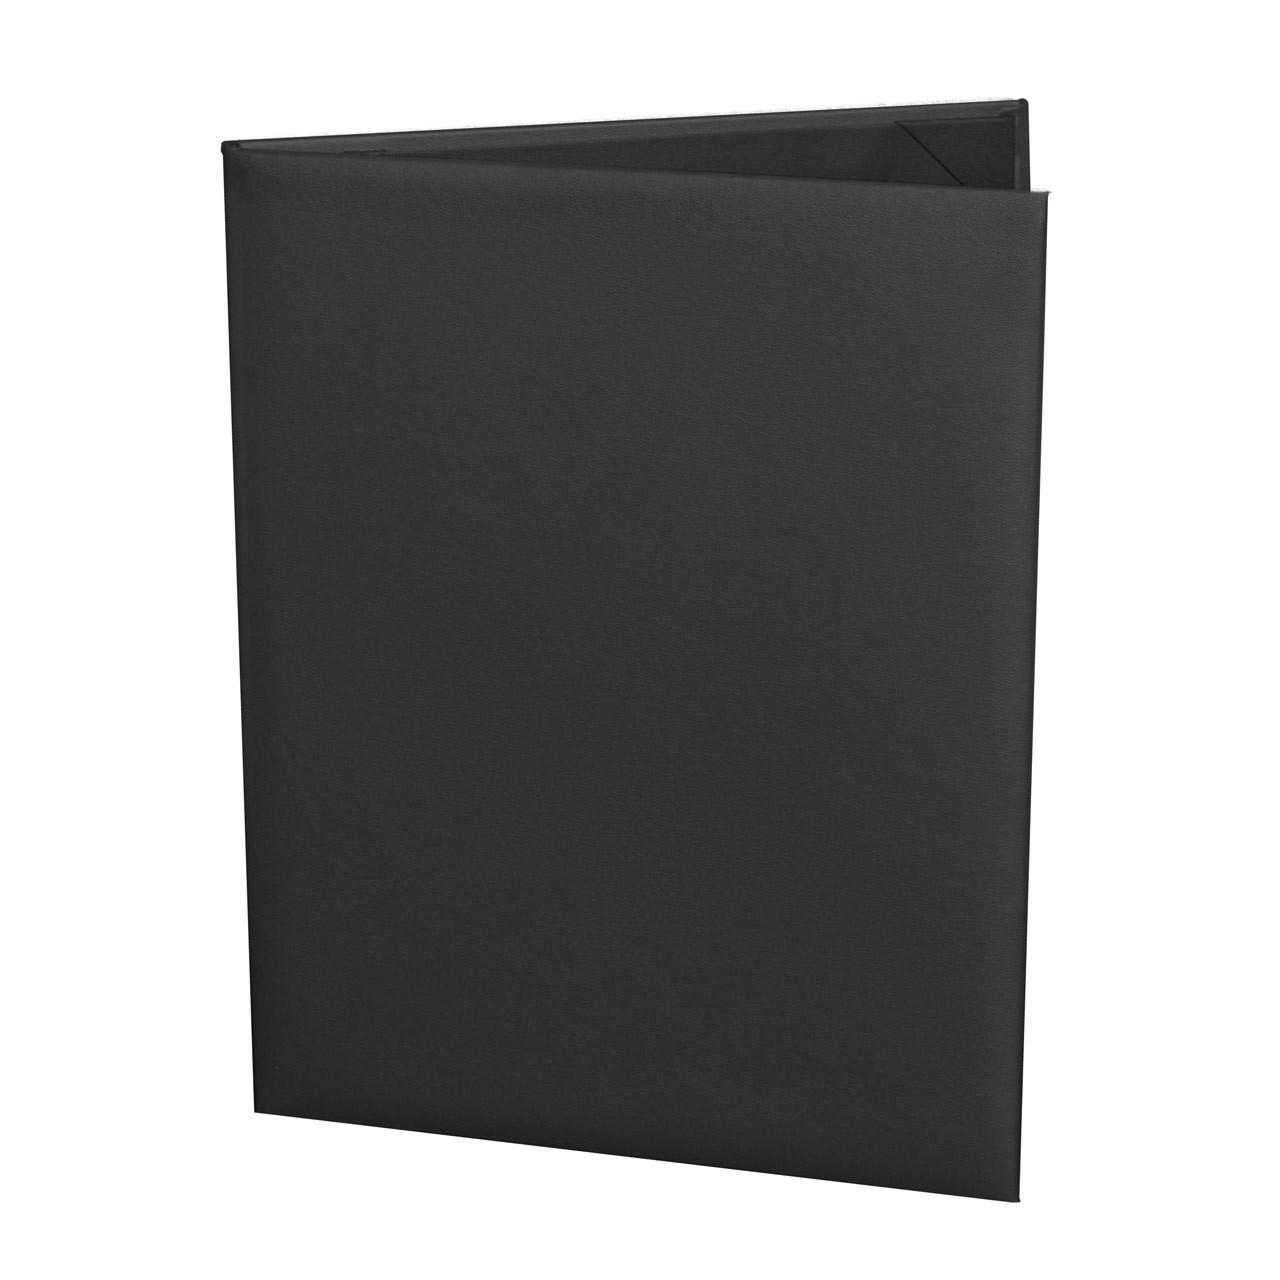 "8 1/2"" x 11"" Insert Menu Cover 2-panel black"